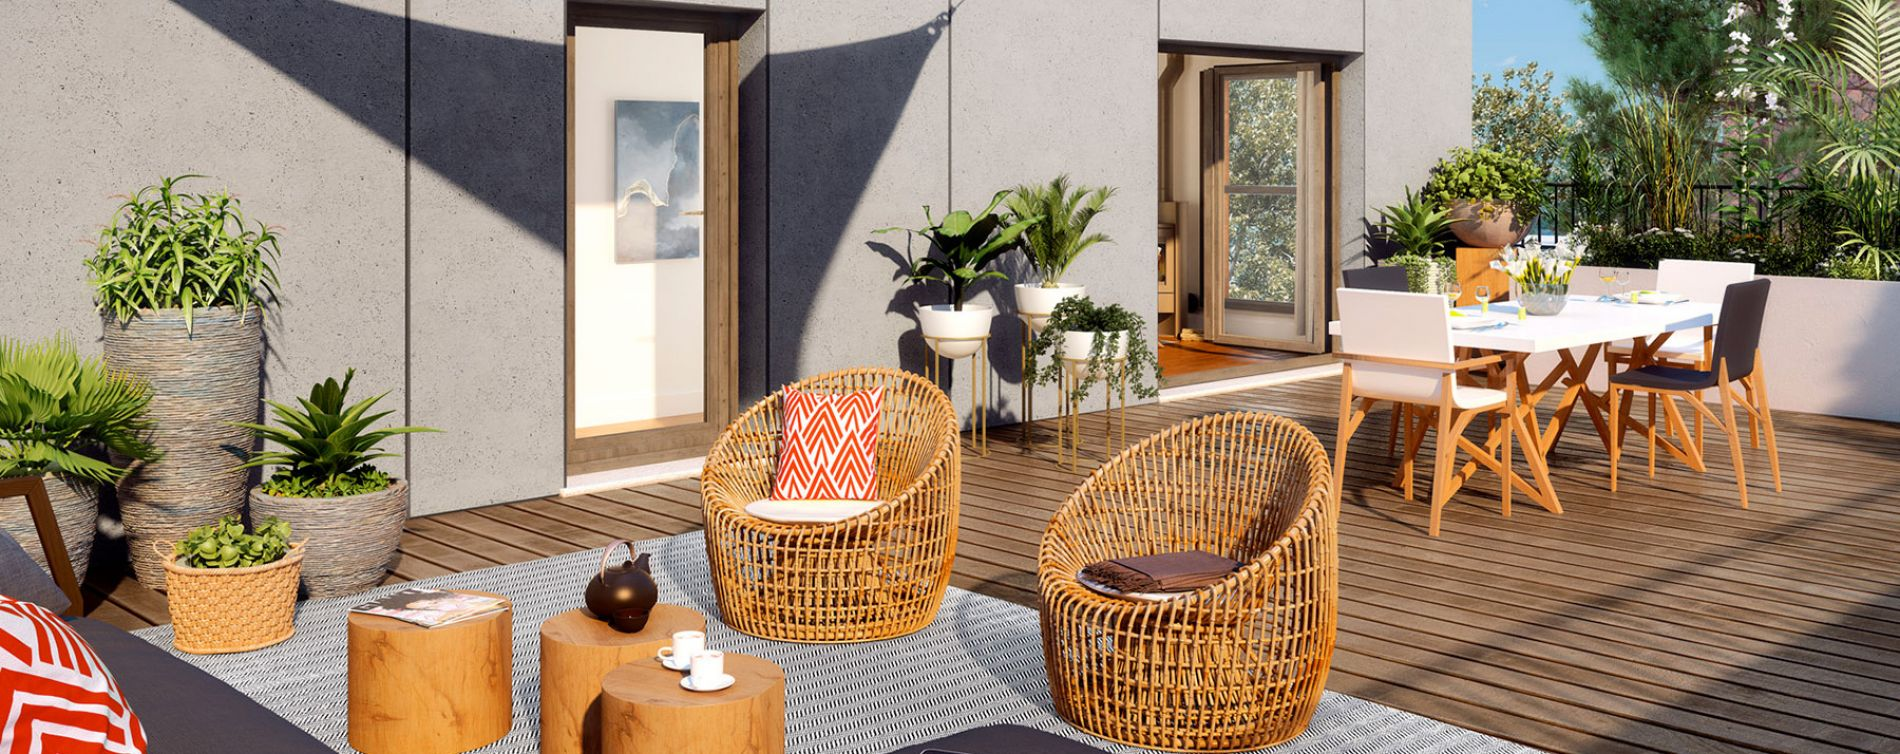 Massy : programme immobilier neuve « Les Ginkgos - Canopée » (3)